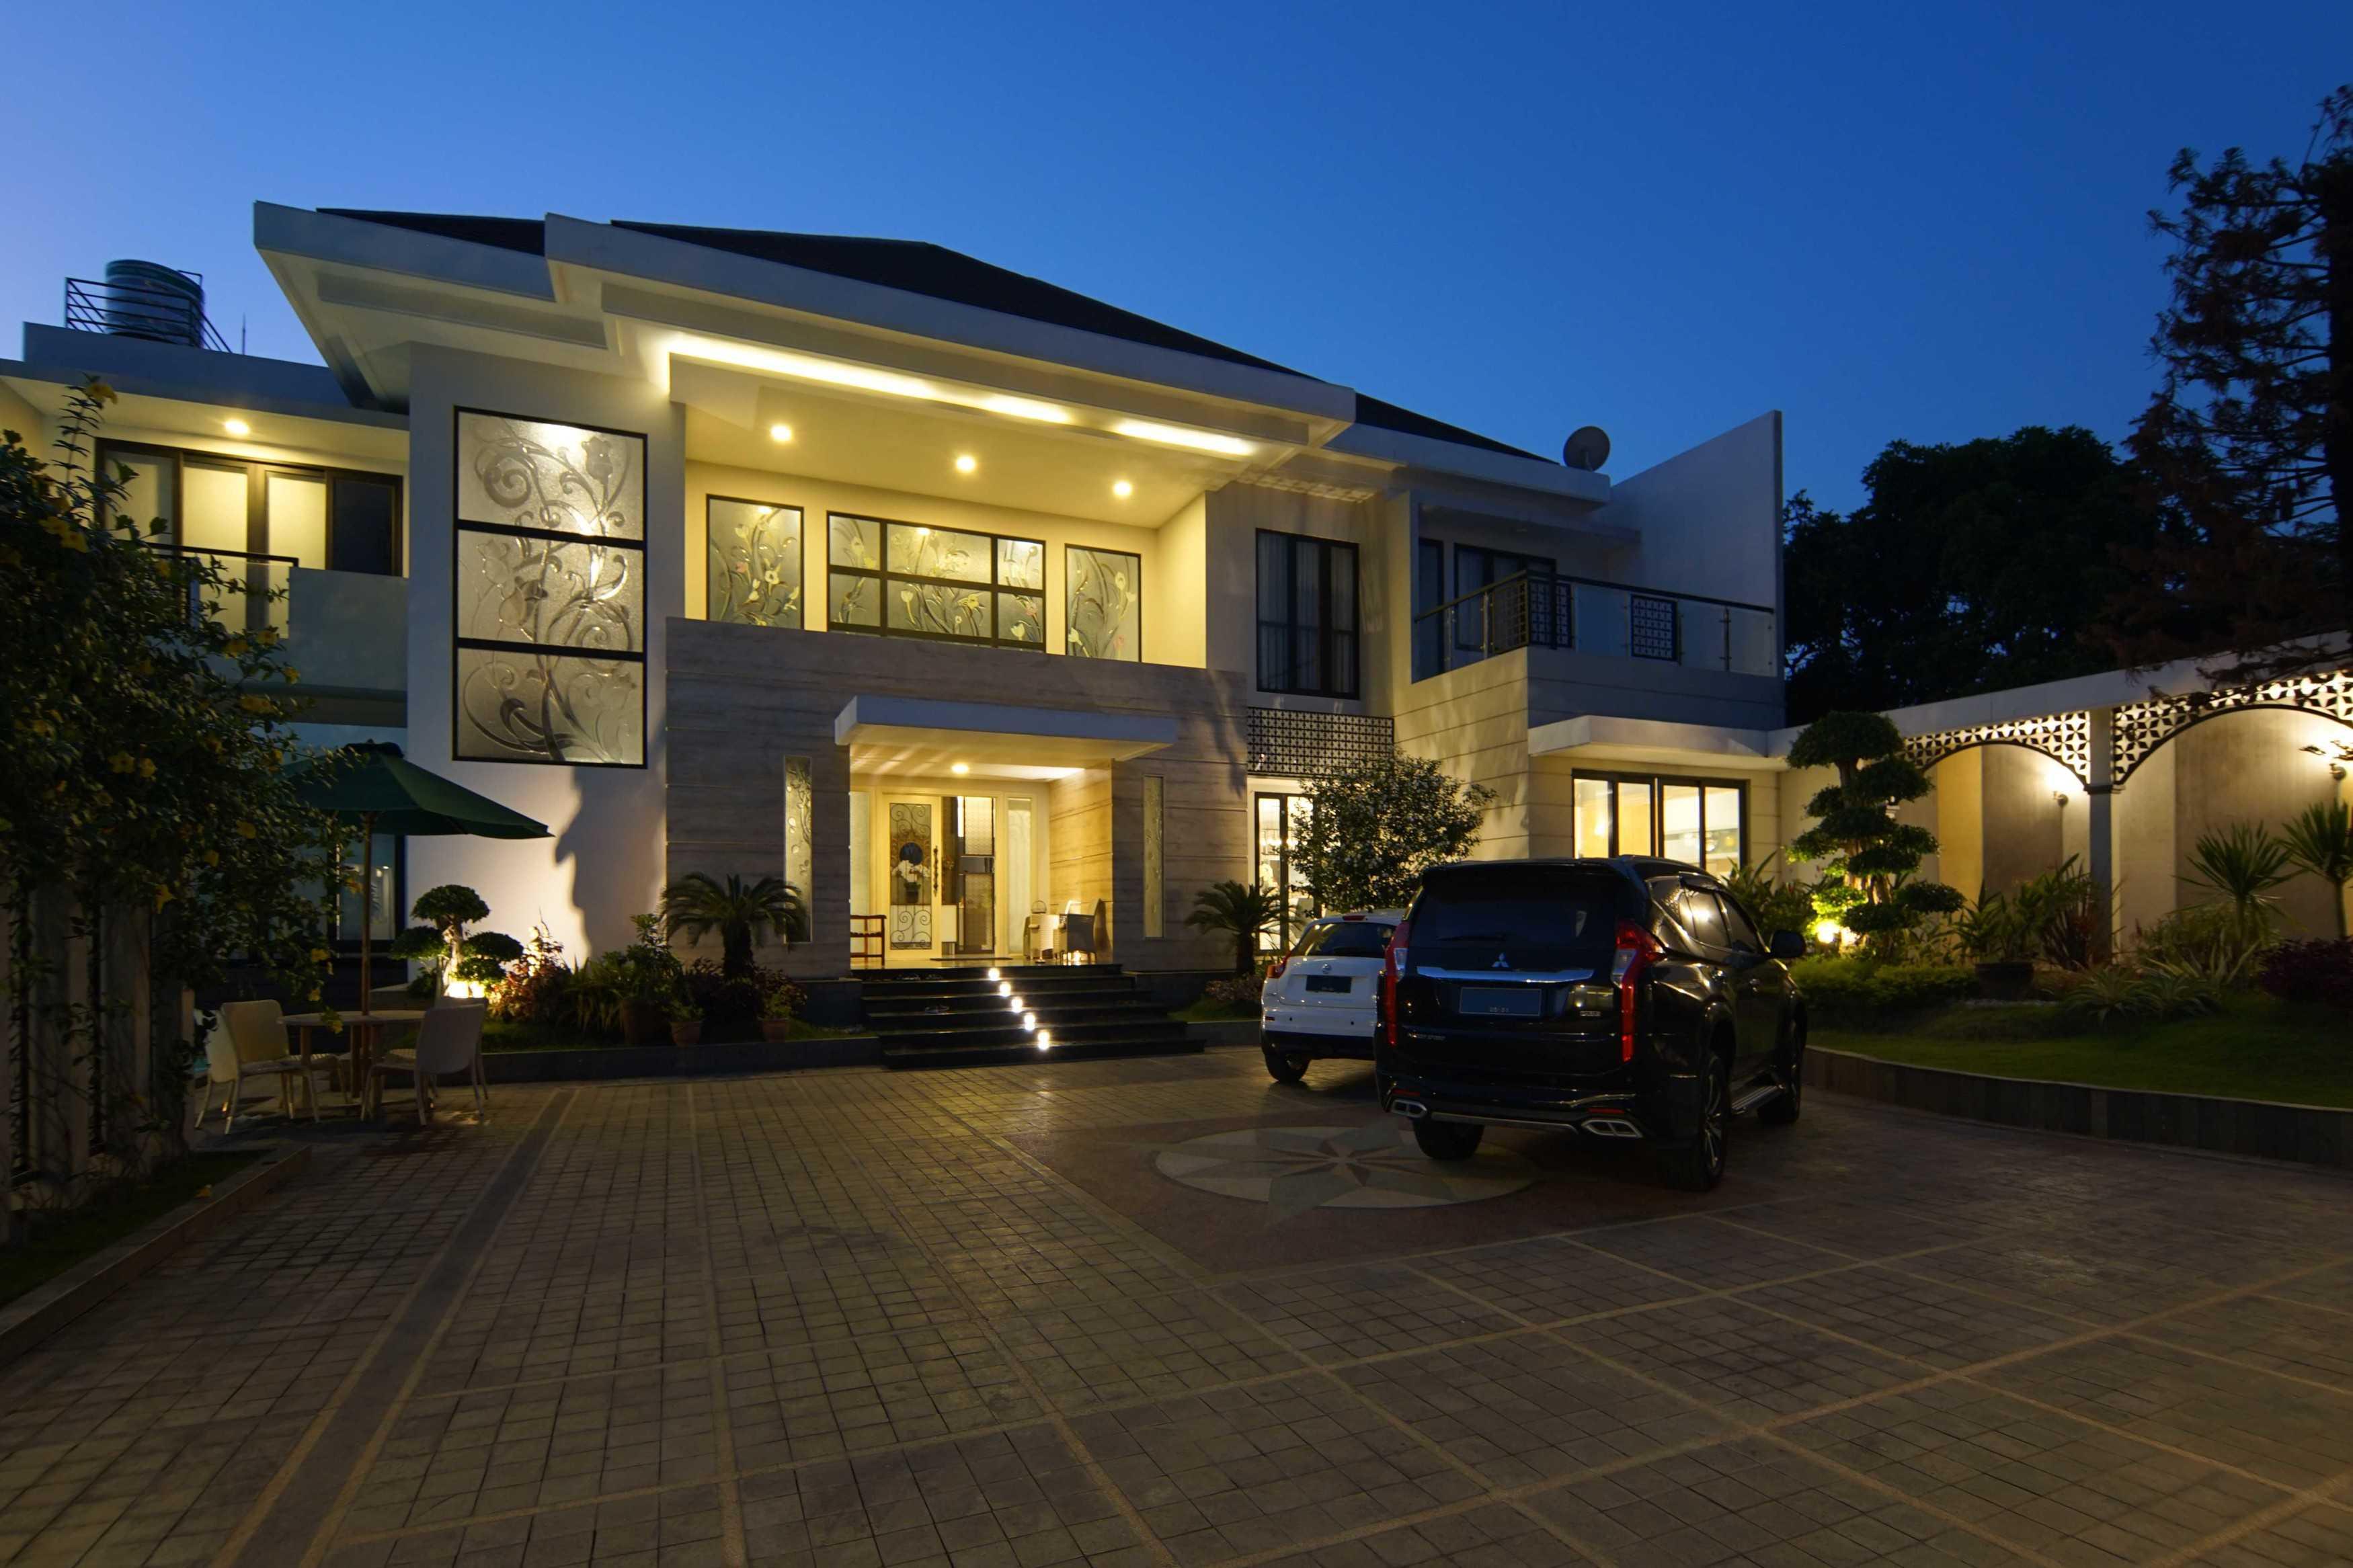 .nicky Setiabudi Architect (Muse  Design) Pl House Kabupaten Tuban, Jawa Timur, Indonesia Kabupaten Tuban, Jawa Timur, Indonesia Facade View At Bluehour Contemporary <P>View Dari Arah Akses Masuk.</p> 50010